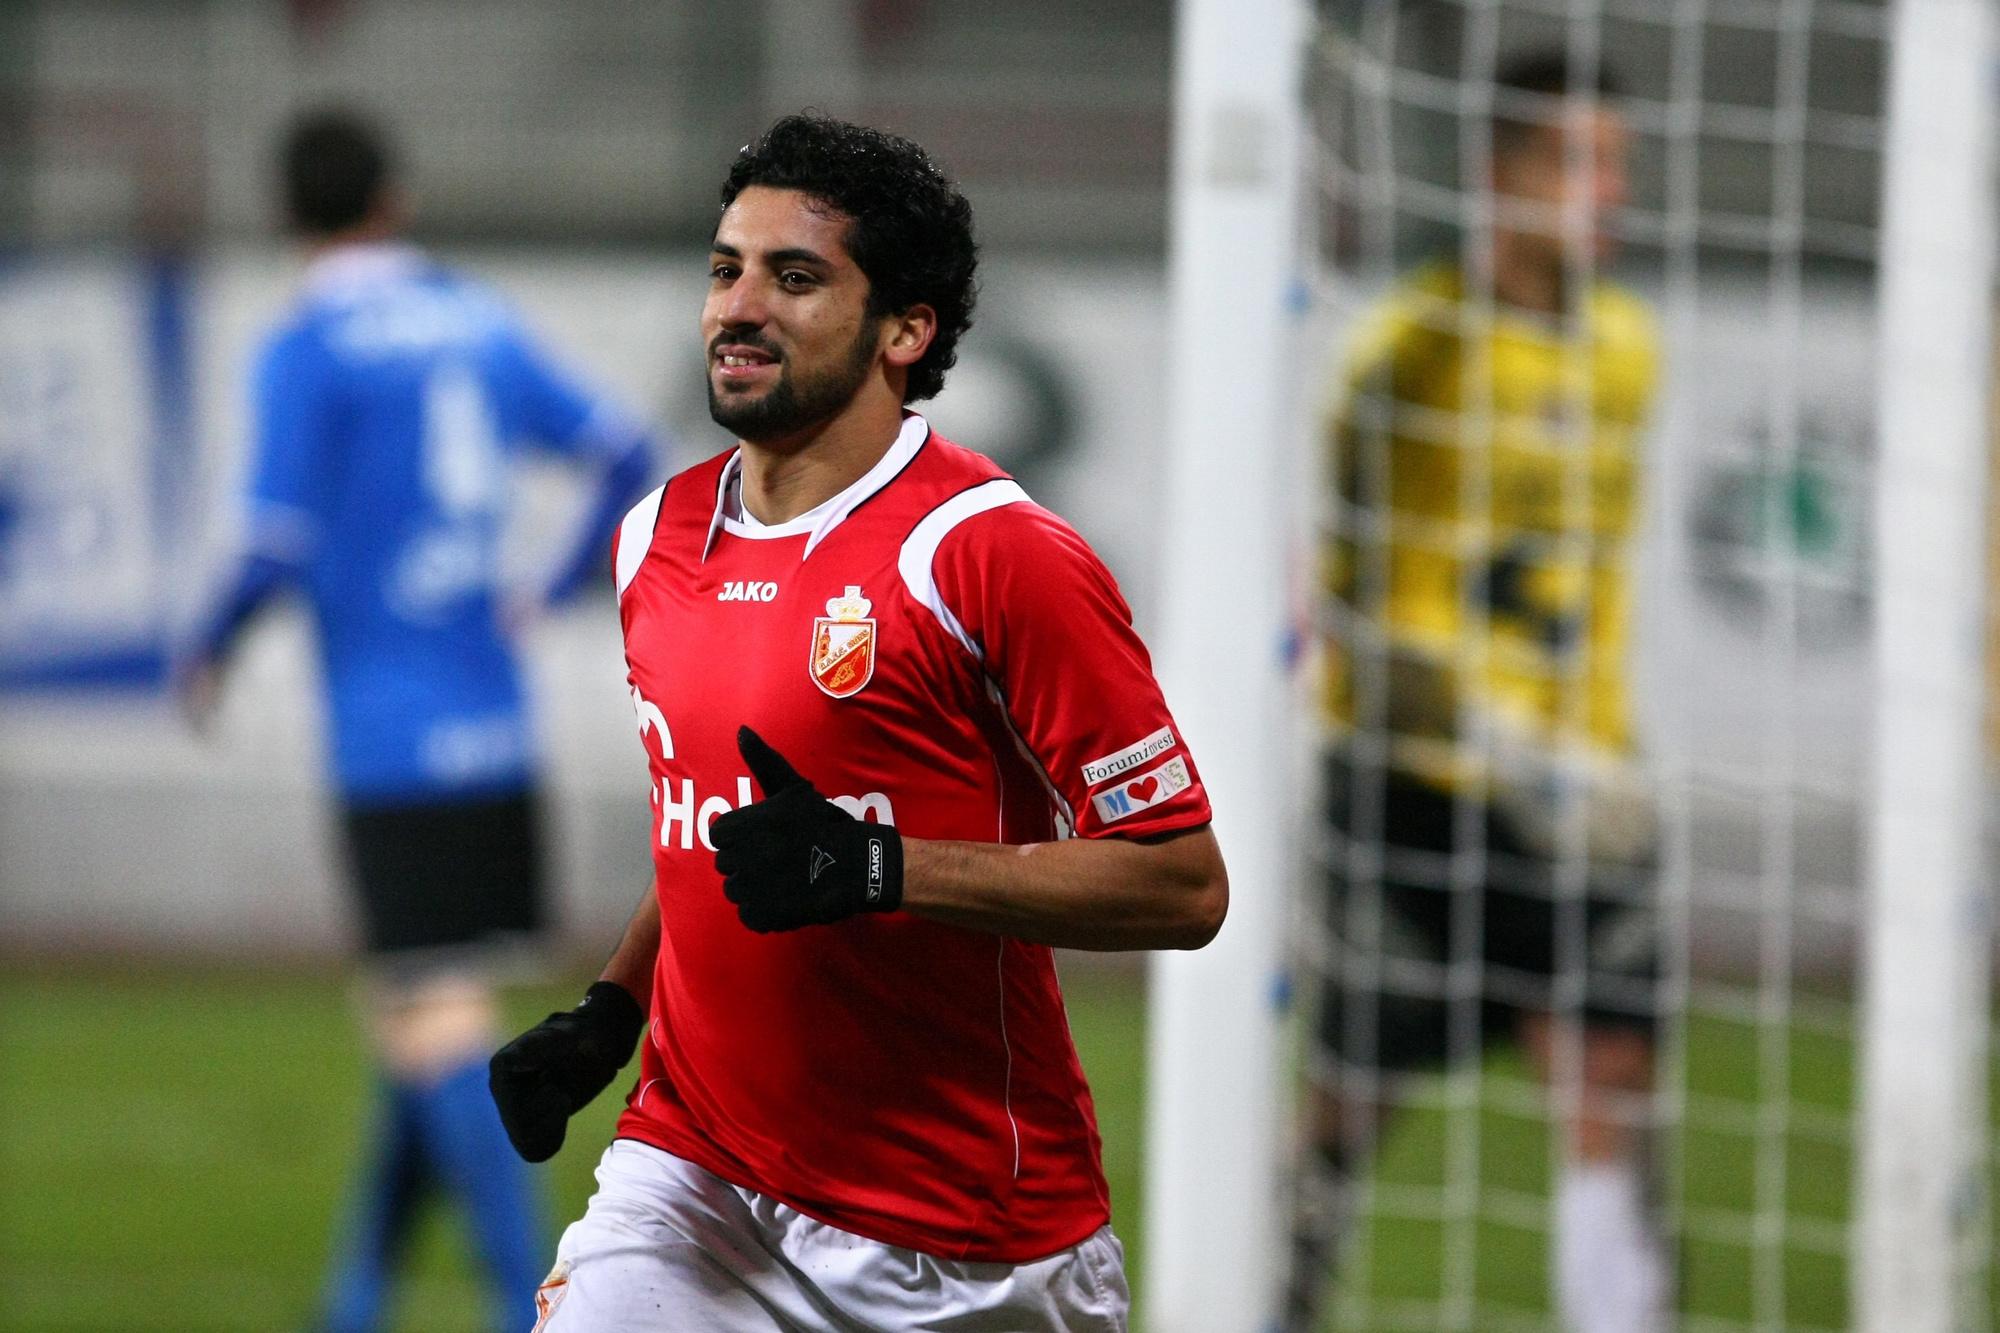 Mohamed Dahmane sous le maillot de Mons., belga